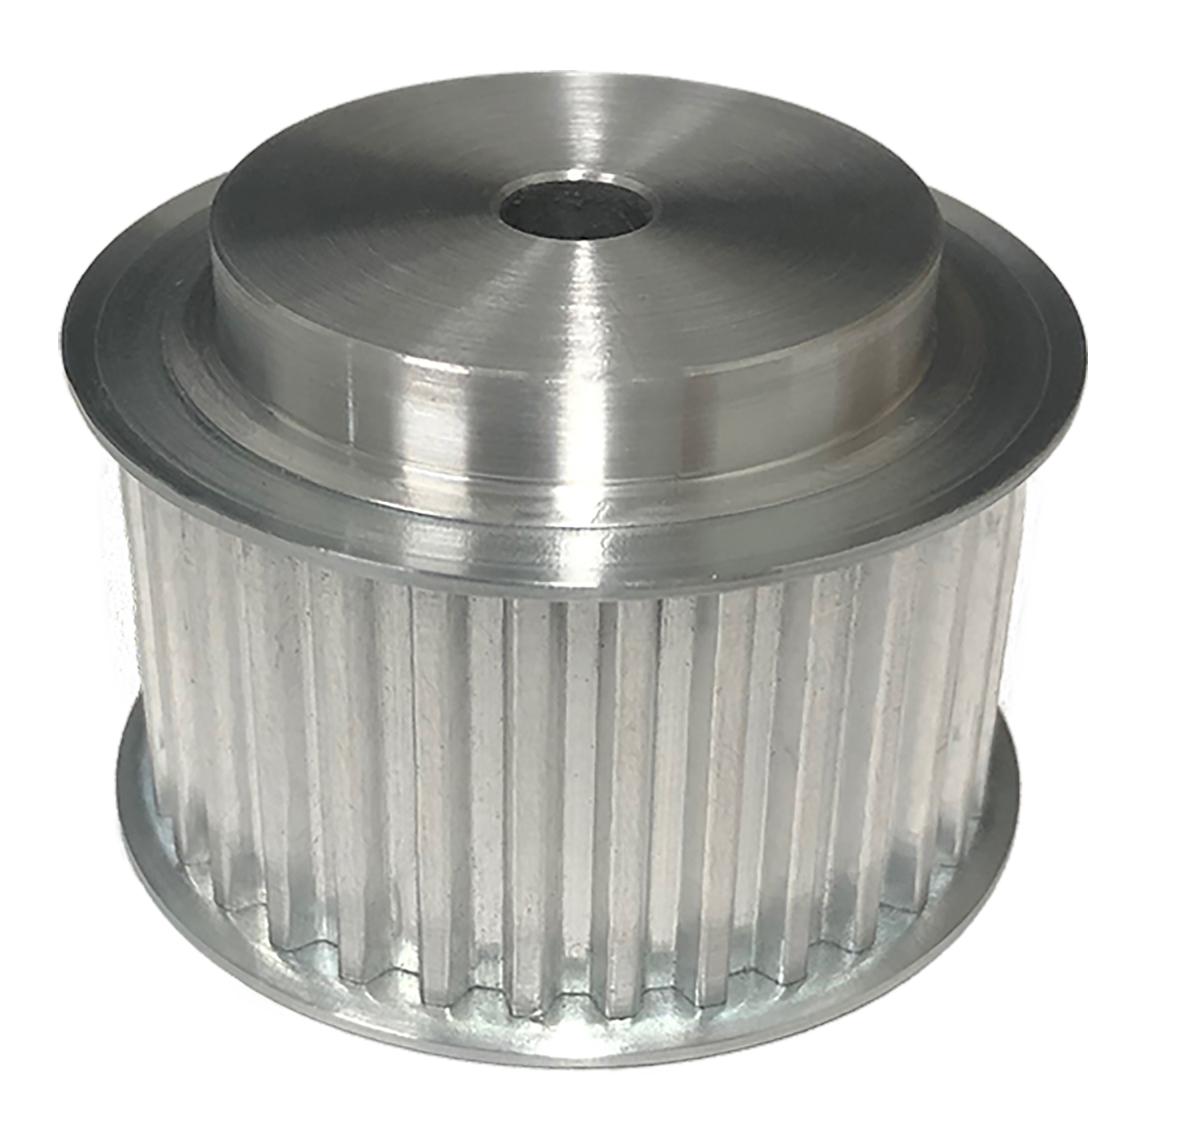 36T5/25-2 - Aluminum Metric Pulleys